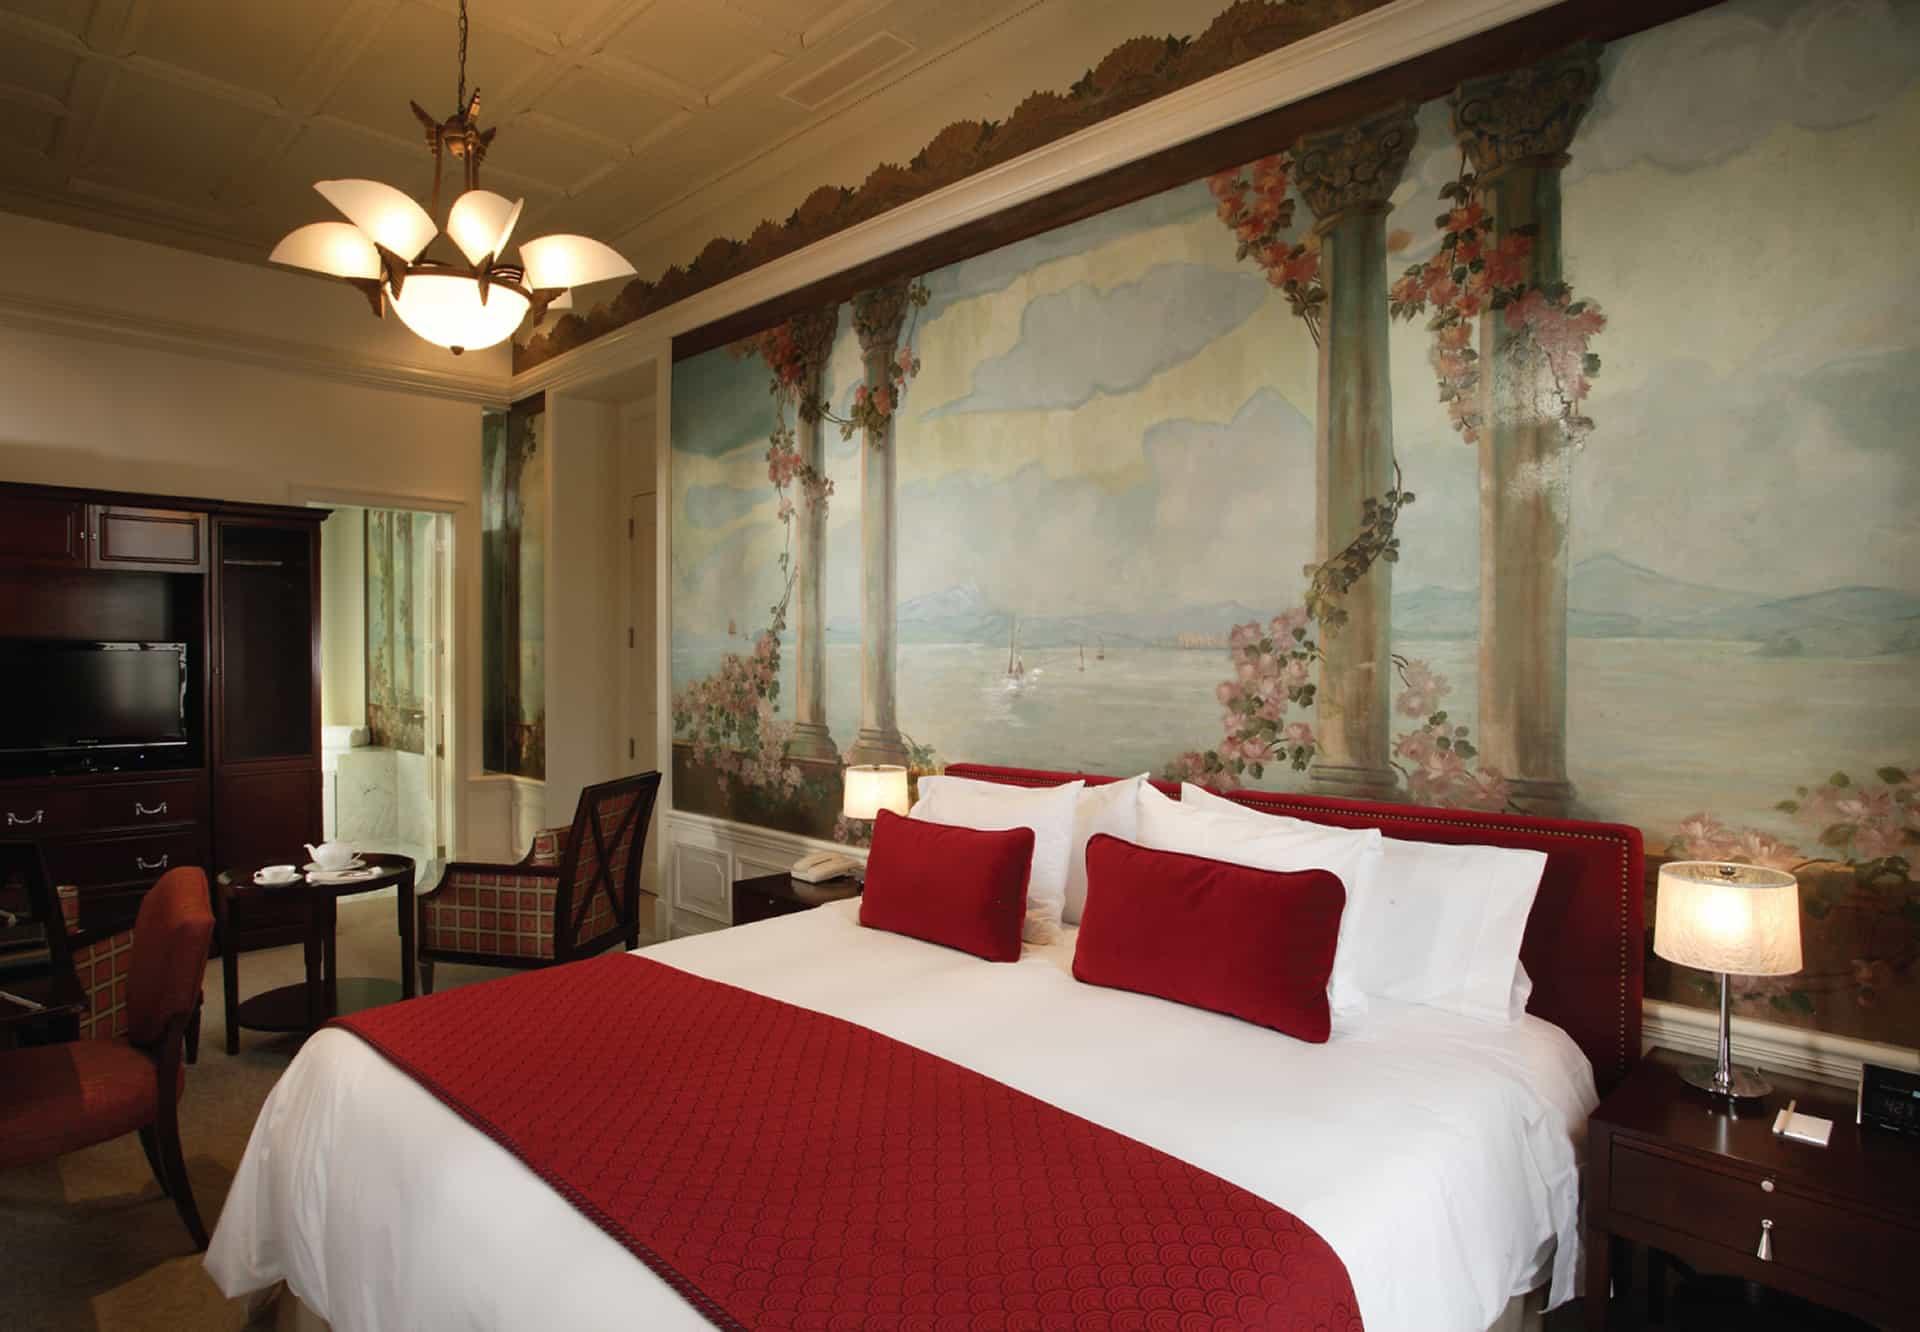 varios - Rooms-Suite-casagangotena.jpg